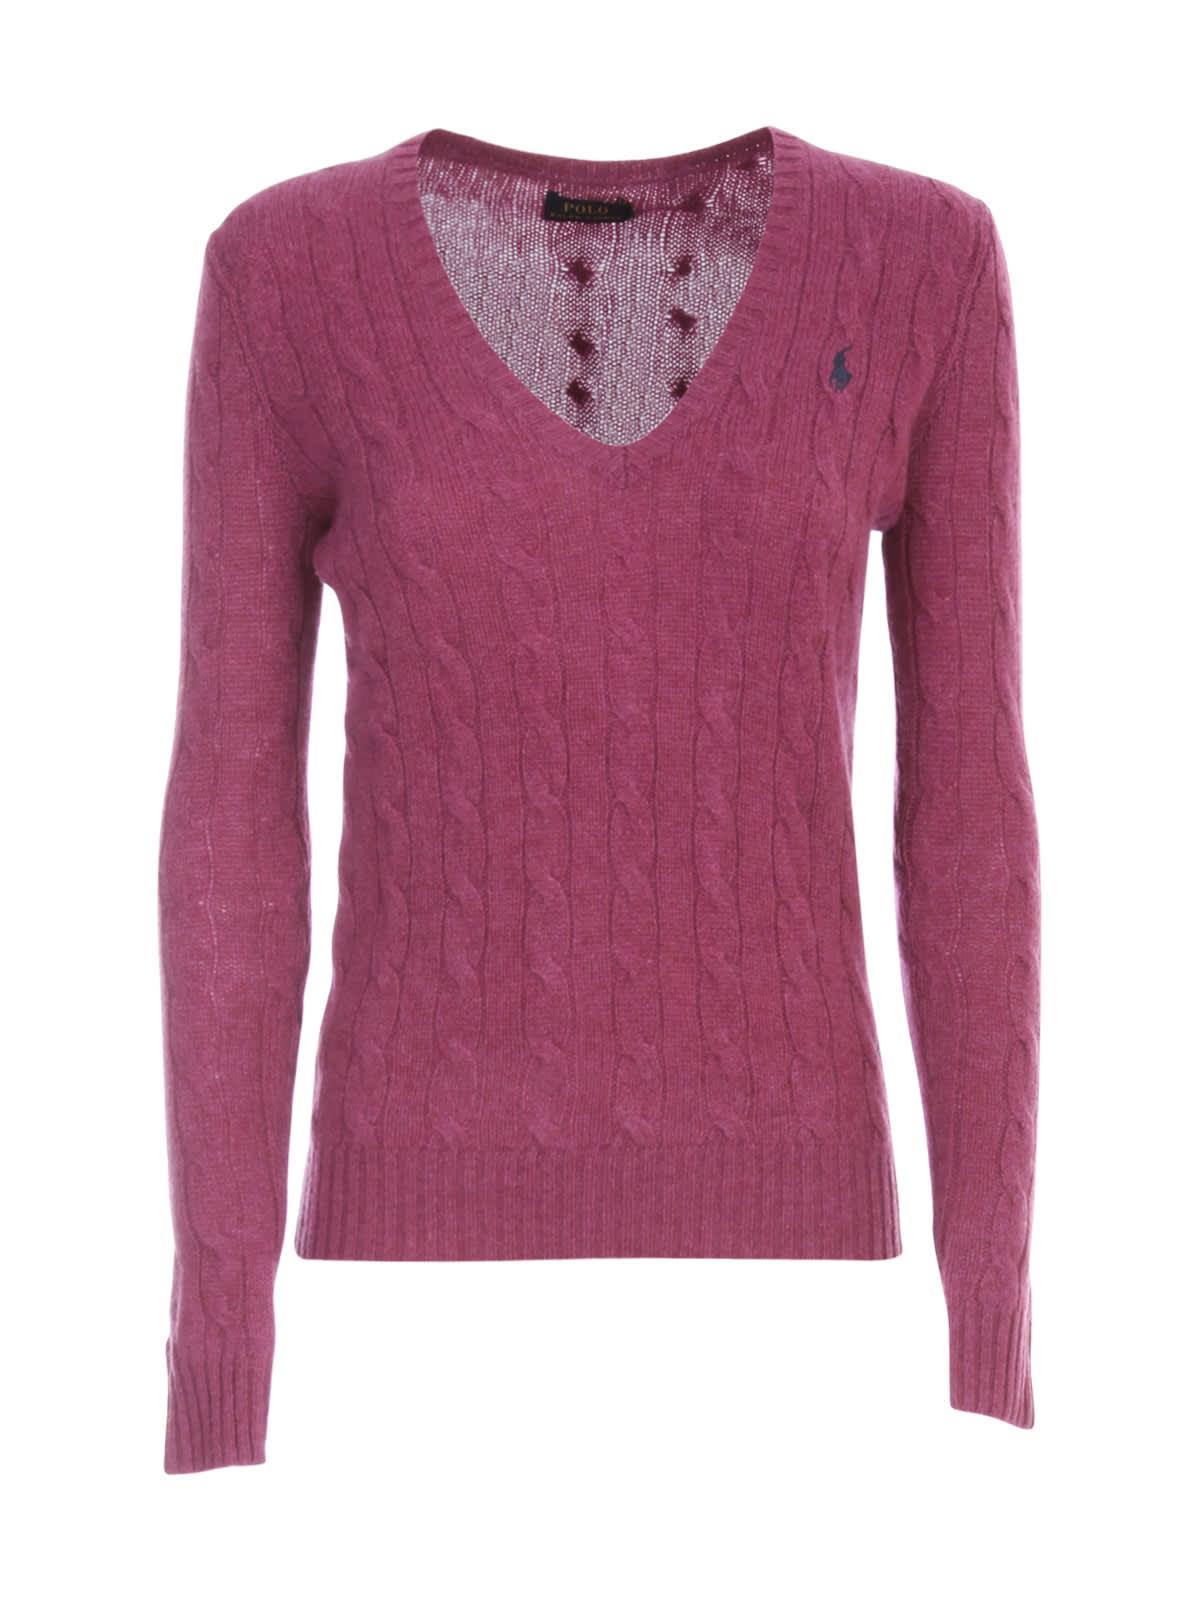 Polo Ralph Lauren Sweater V Neck Neck W/braids